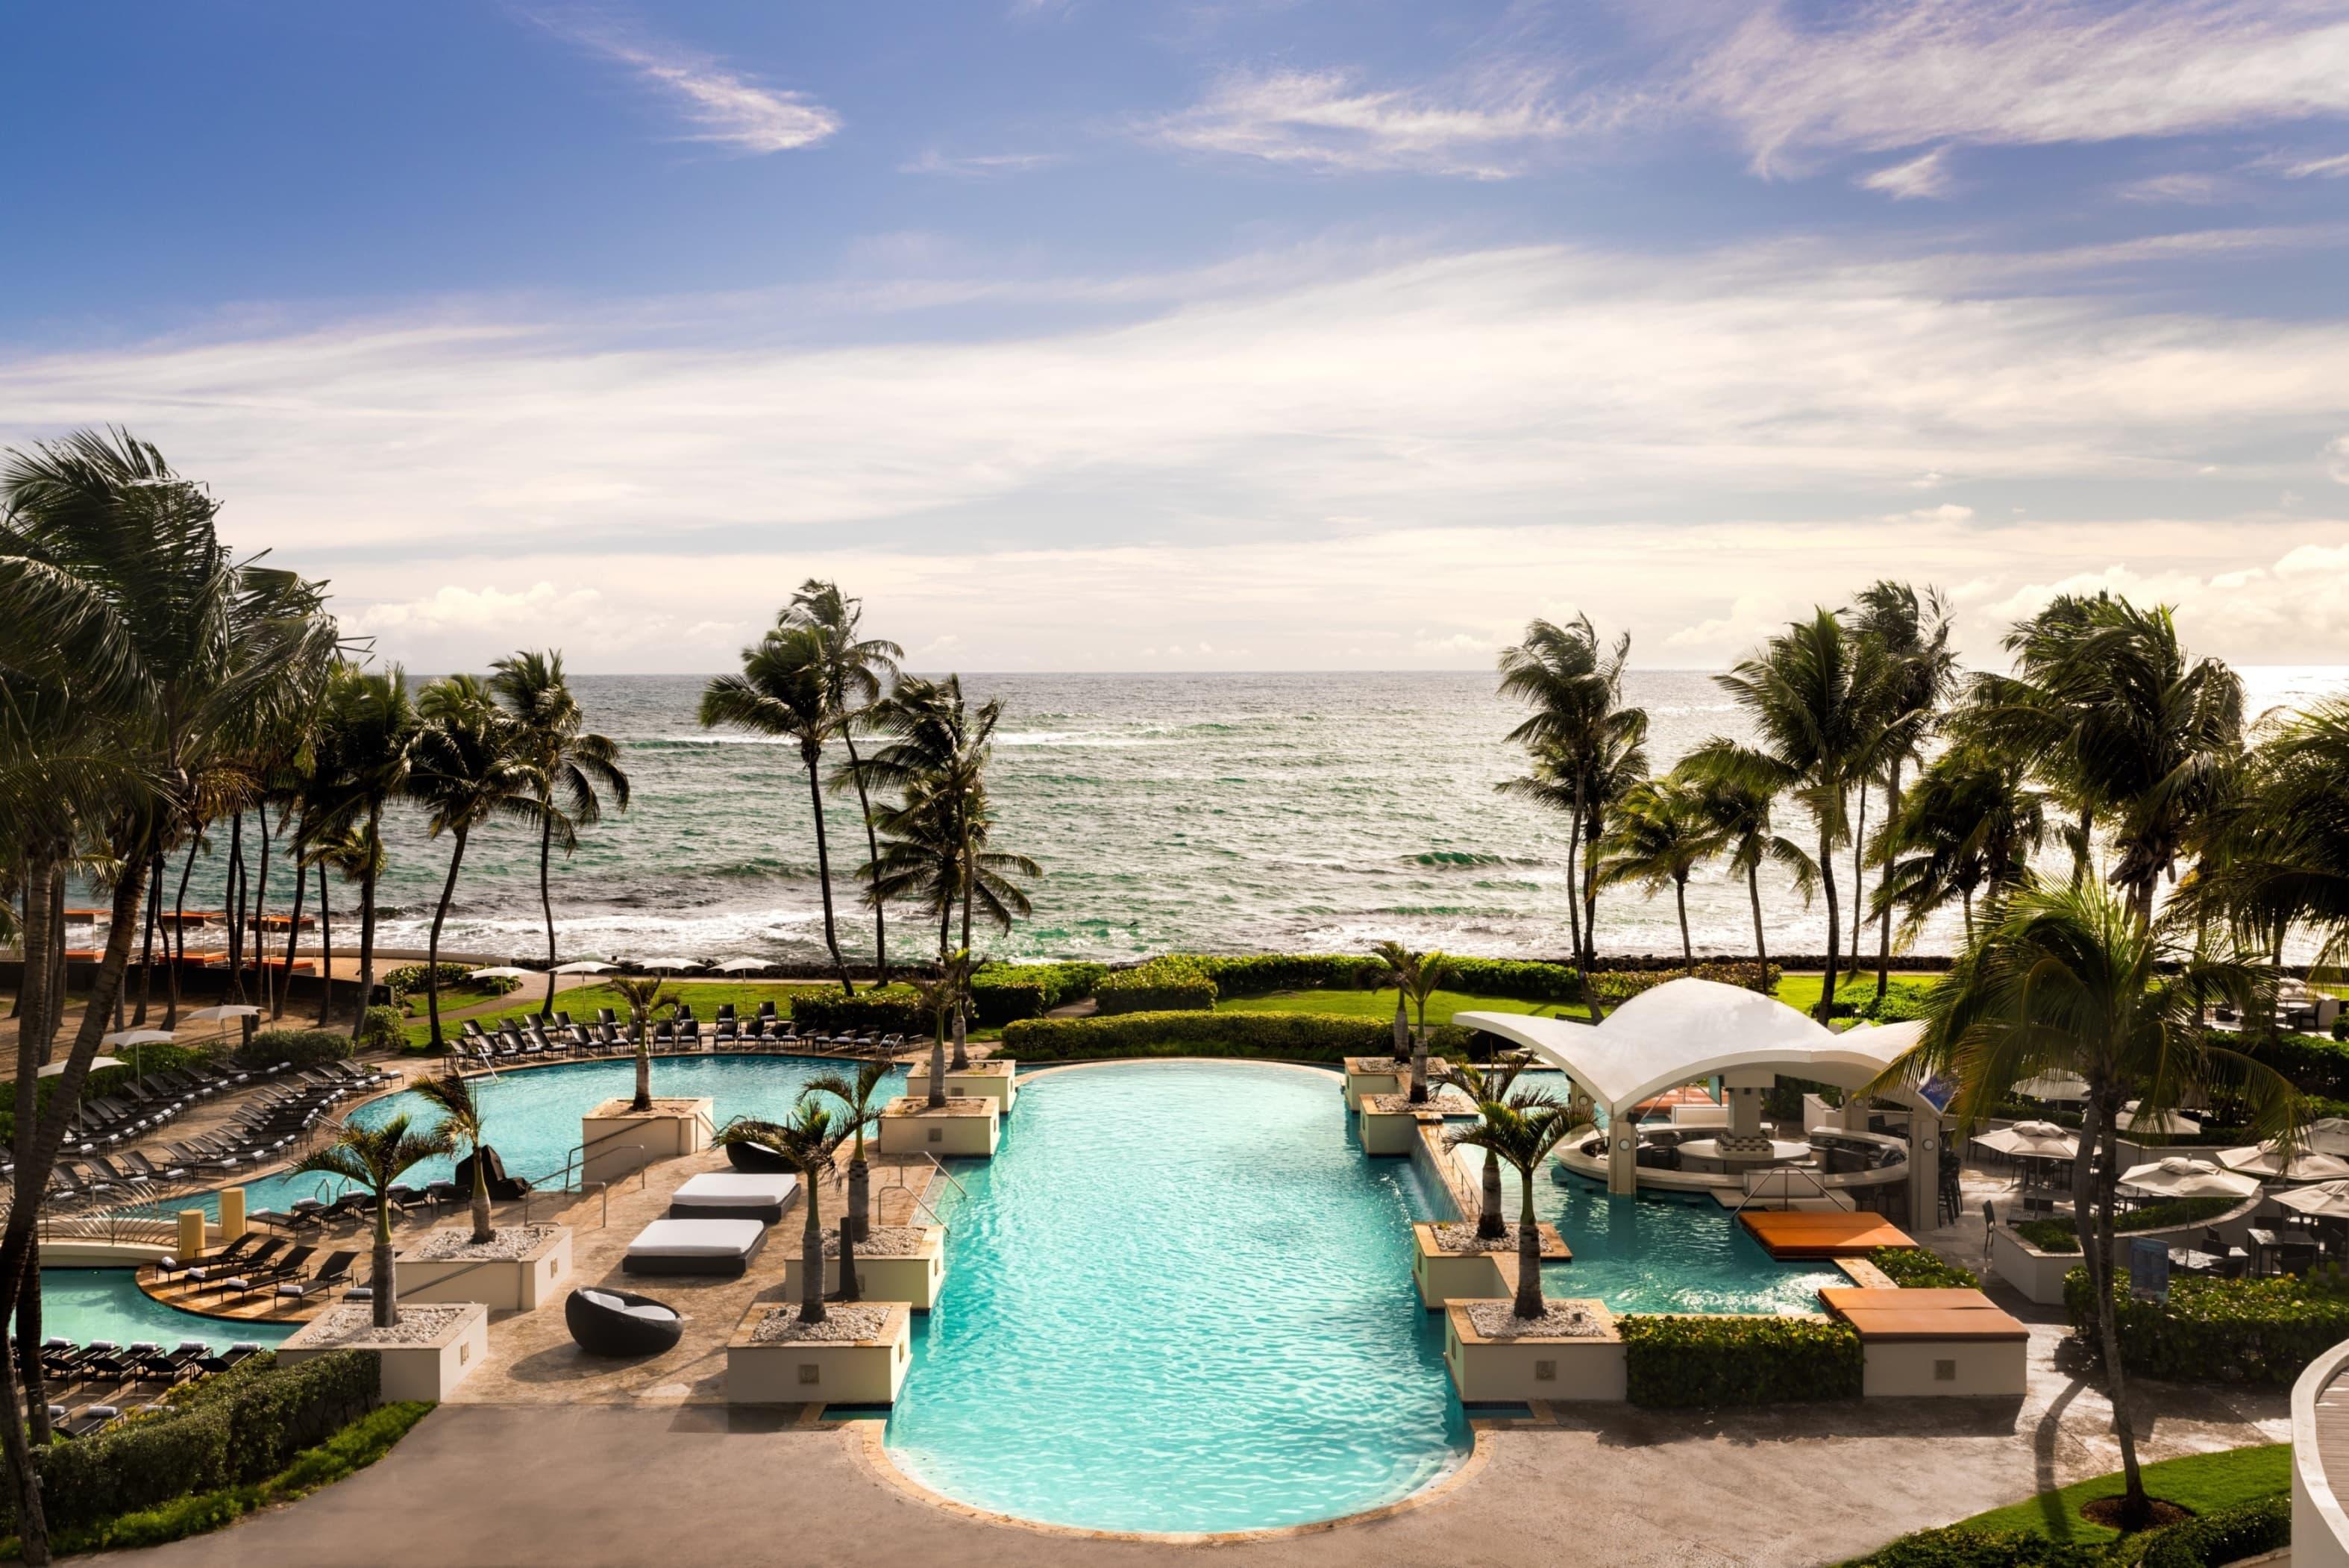 Caribe Hilton Pool